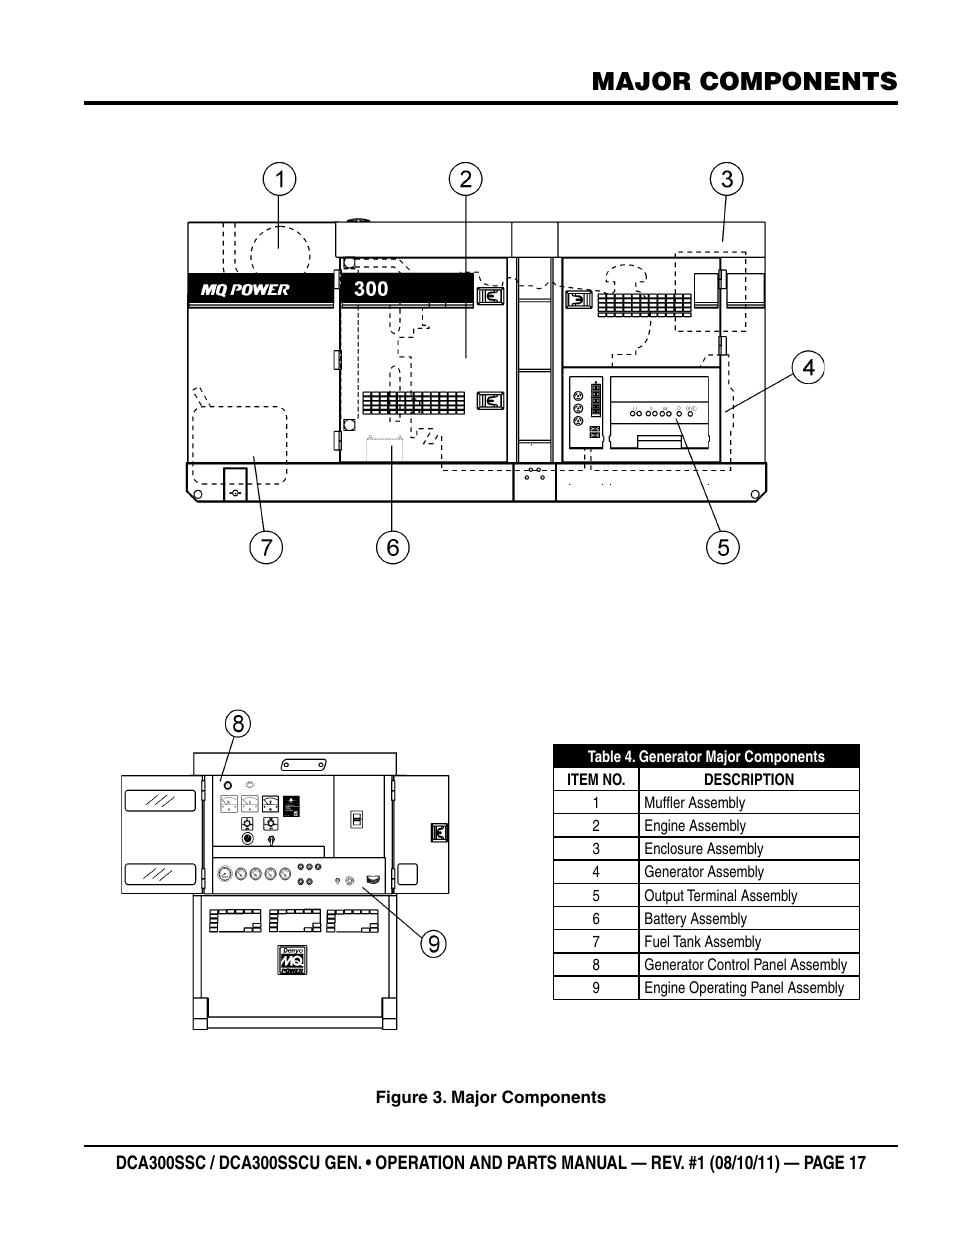 Major components   Multiquip Whisperwatt Series 60HZ Generator (Cummins  QSL9-G3 Diesel Engine) DCA300SSCU User Manual   Page 17 / 104